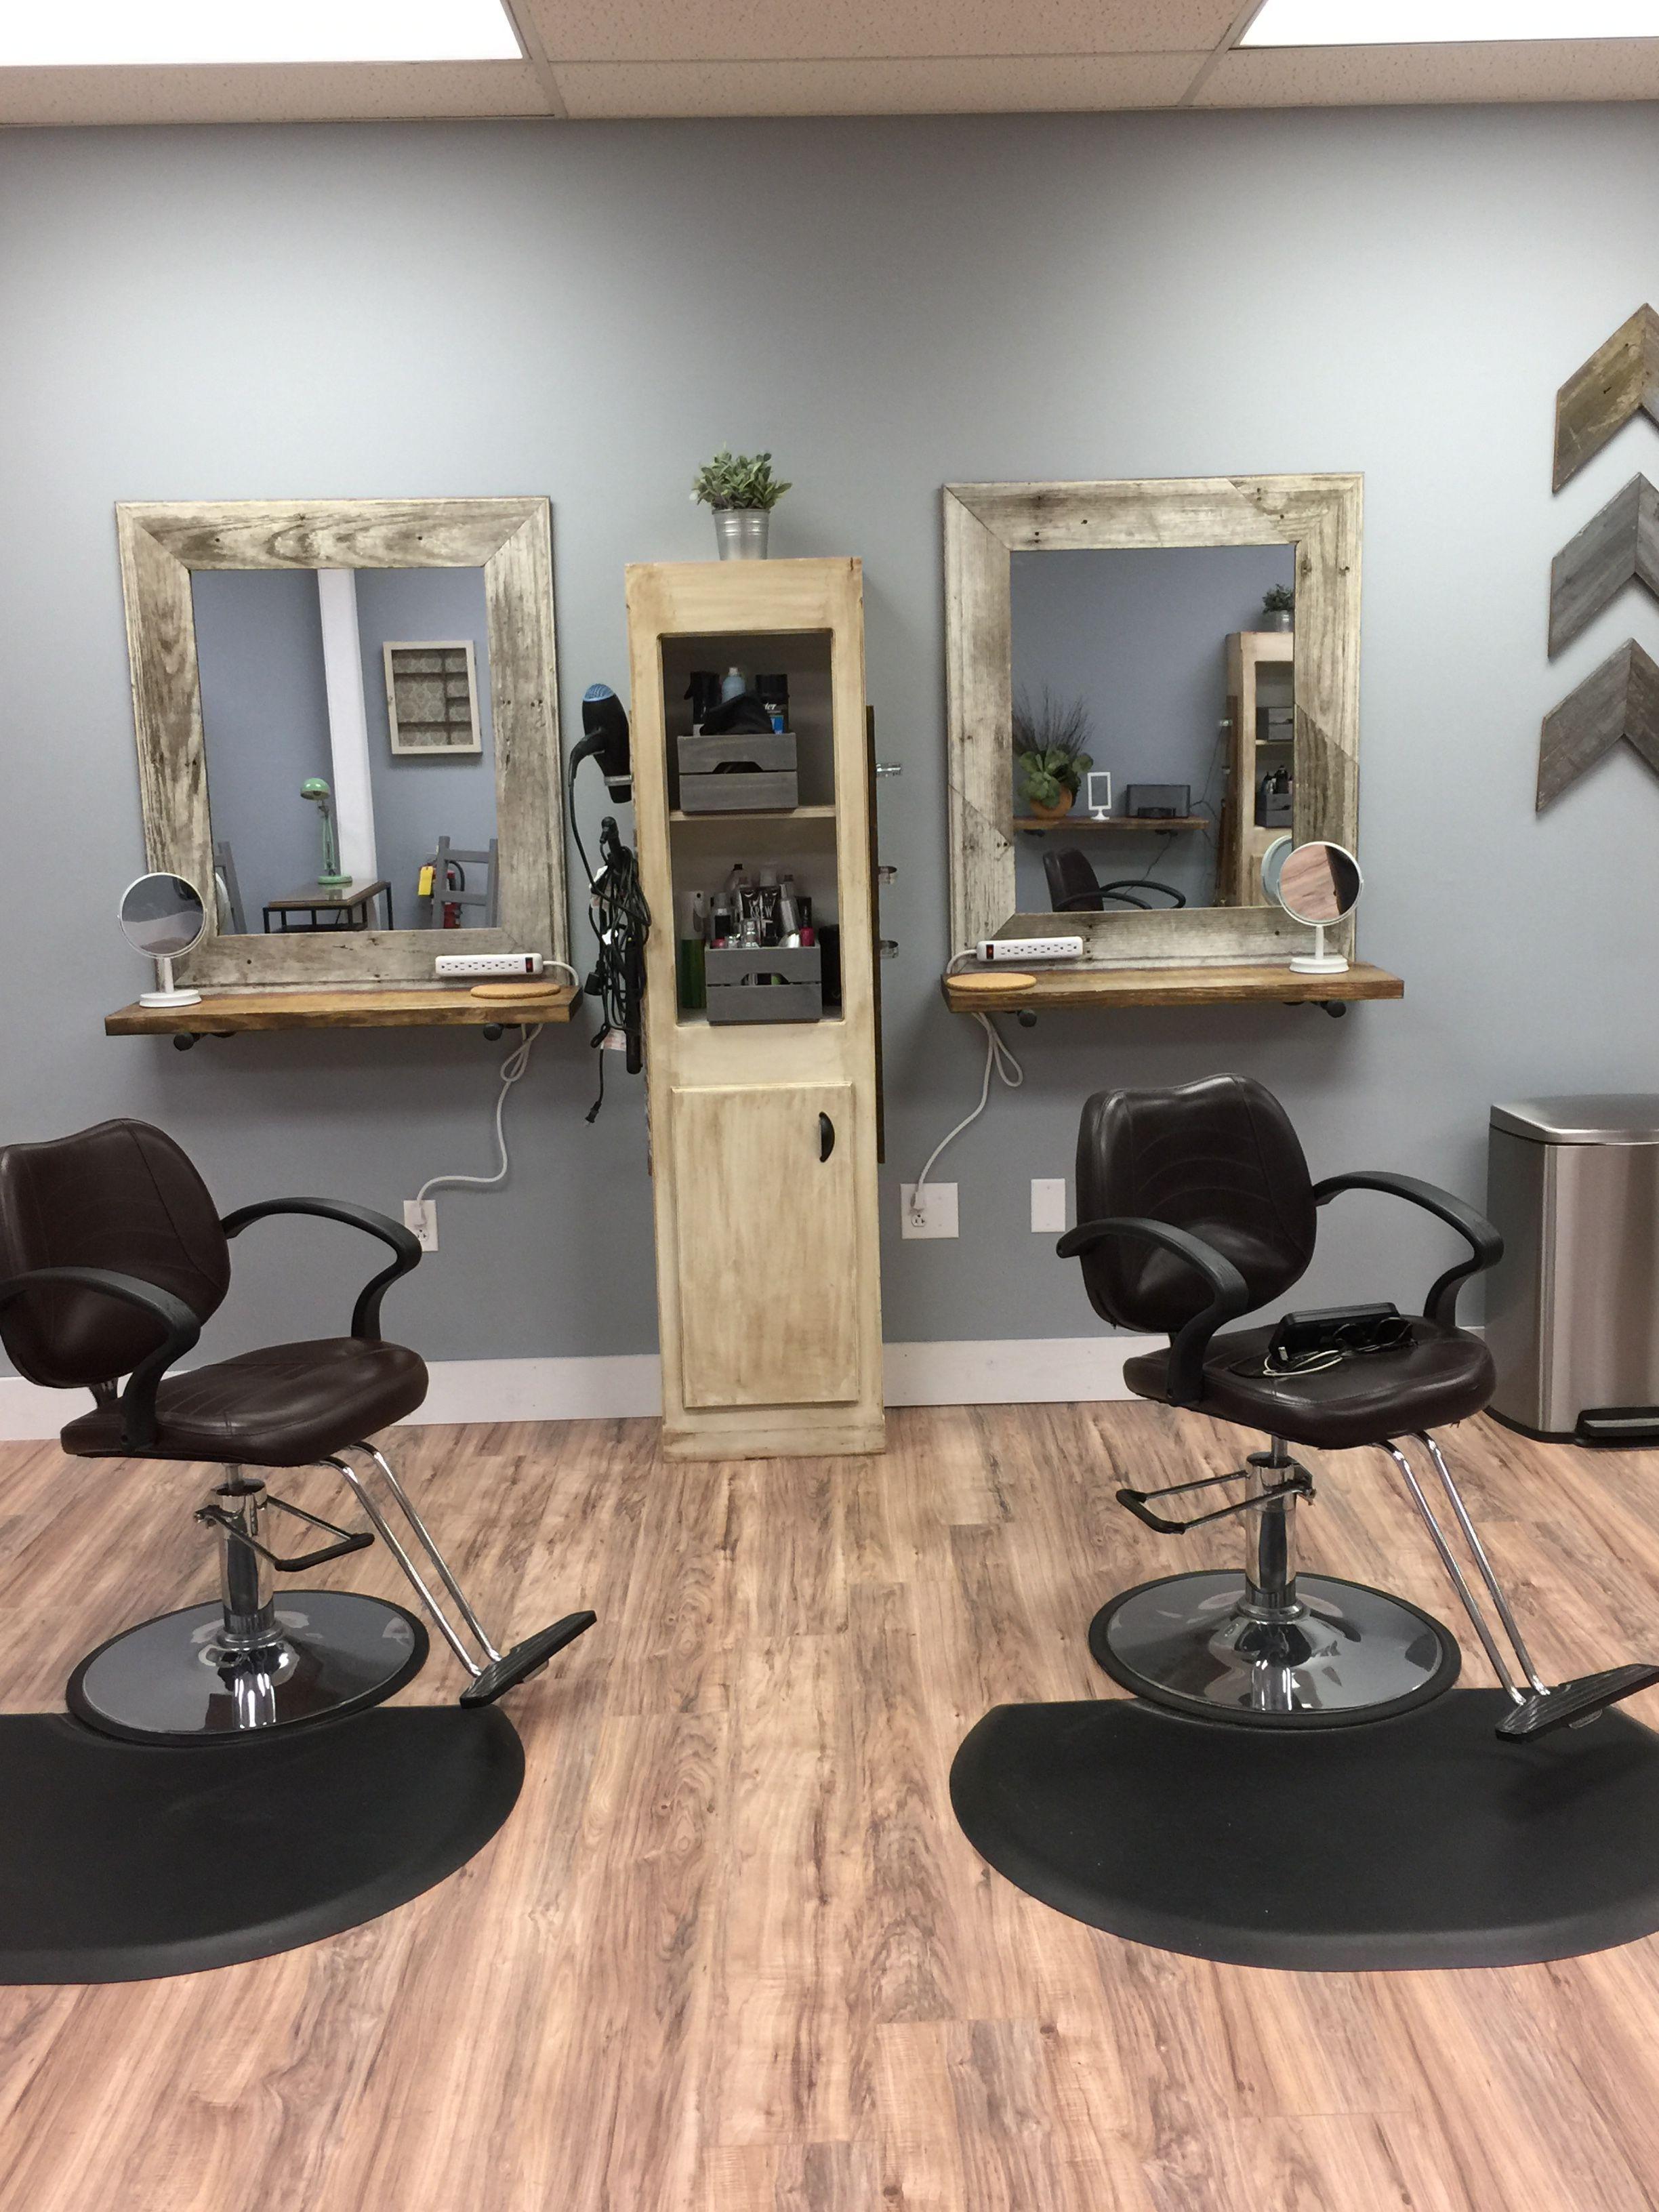 Salon Interior Design South Africa Salon Interior Design Price List Men S Salon Interior Design Salon Salon Interior Design Salon Decor Hair Salon Interior